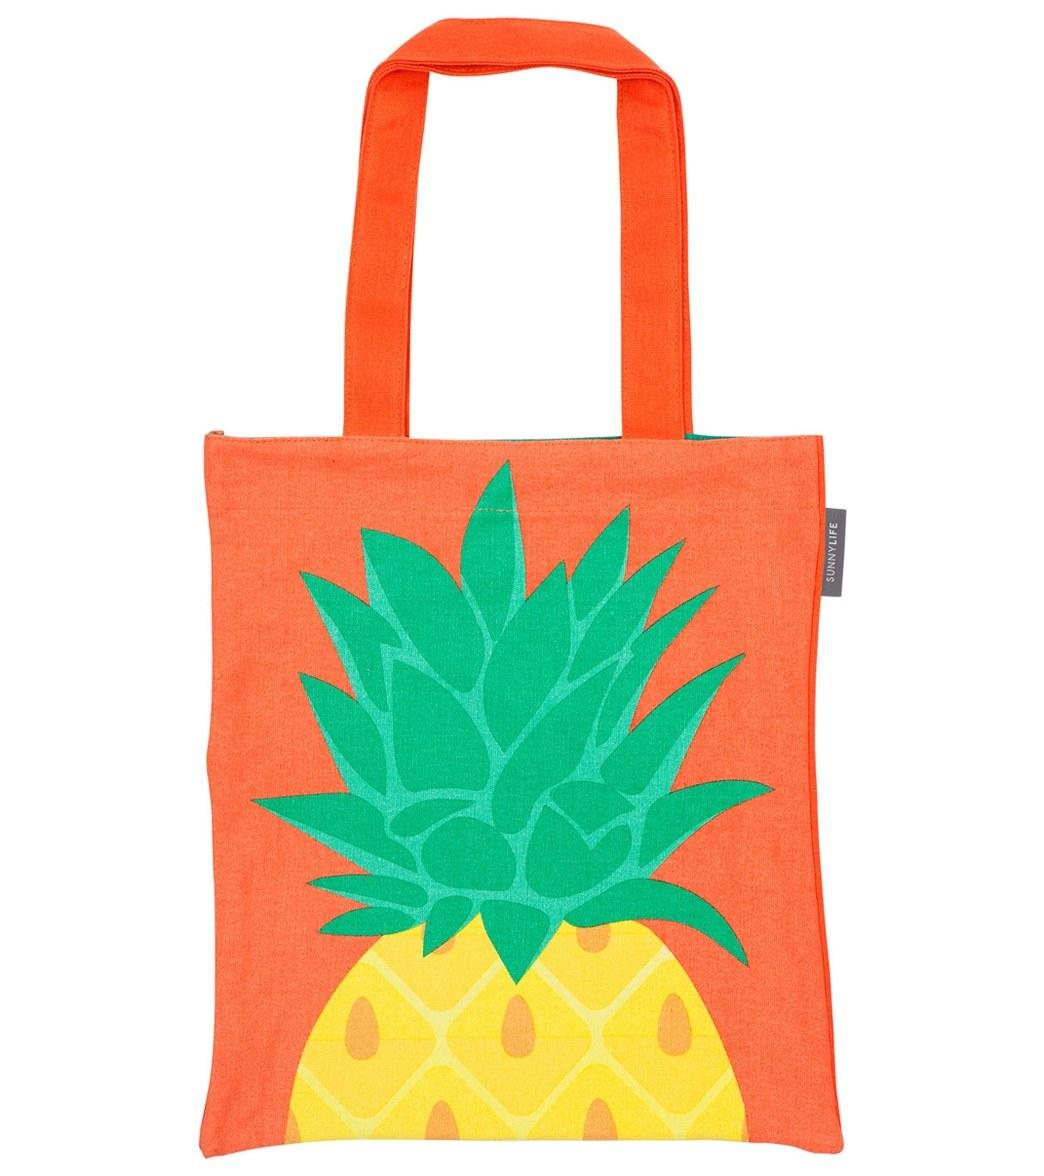 58b28181c7 SunnyLife Pineapple Tote Bag at SwimOutlet.com